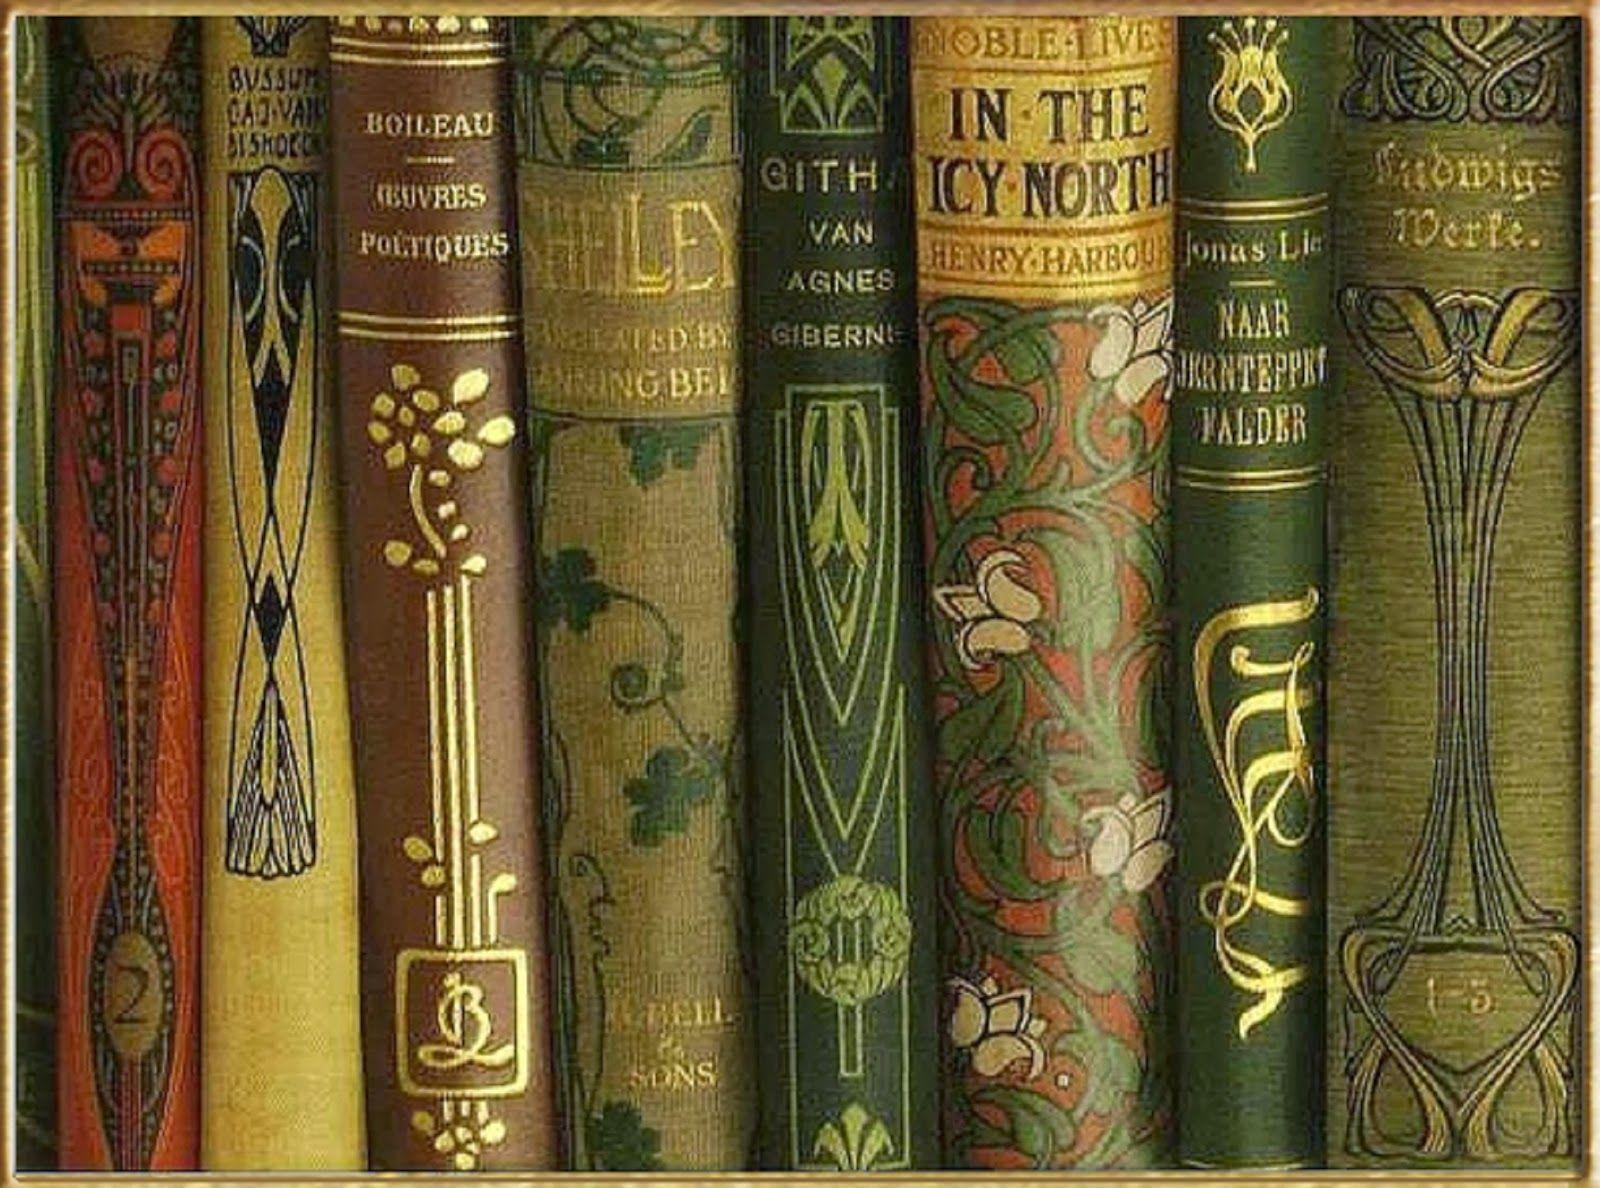 Art Nouveau Book Spines Vintage Books Book Spine Book Art